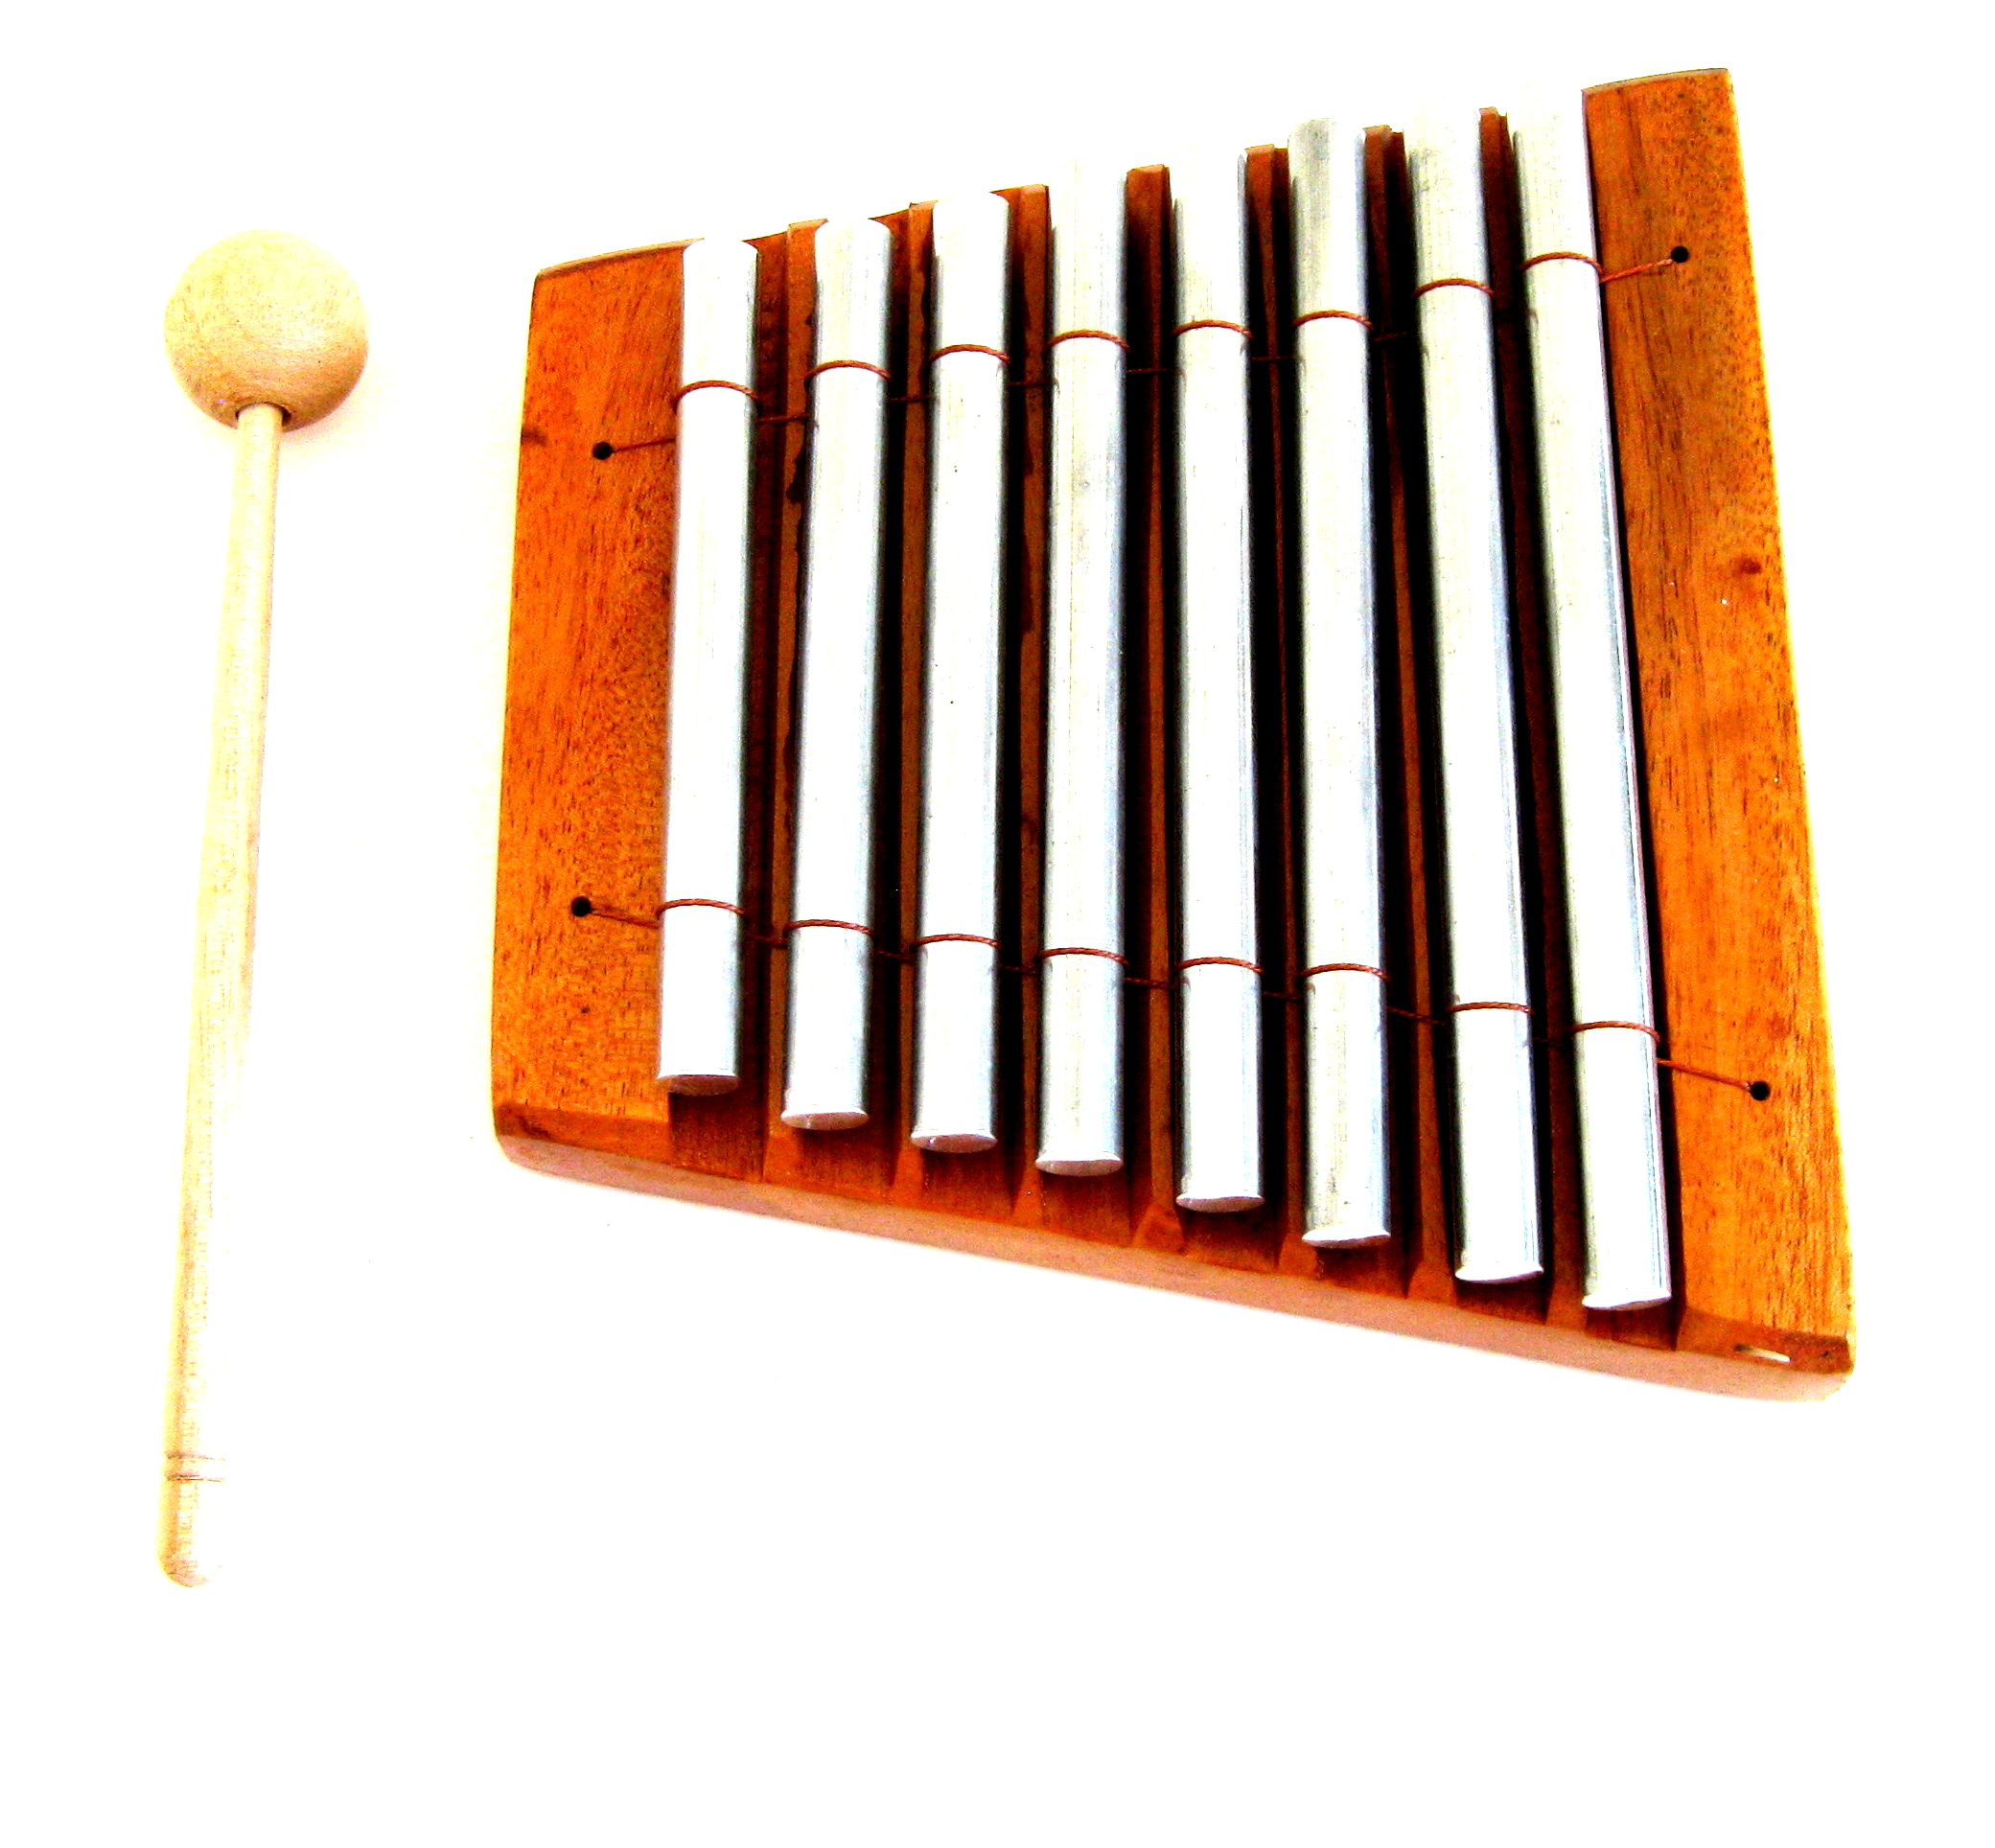 Meditation Chime Energy Chime Wood Percussion Chakra Chime, 8 Bars, Xylophone - PROFESSIONAL SOUND- JIVE BRAND